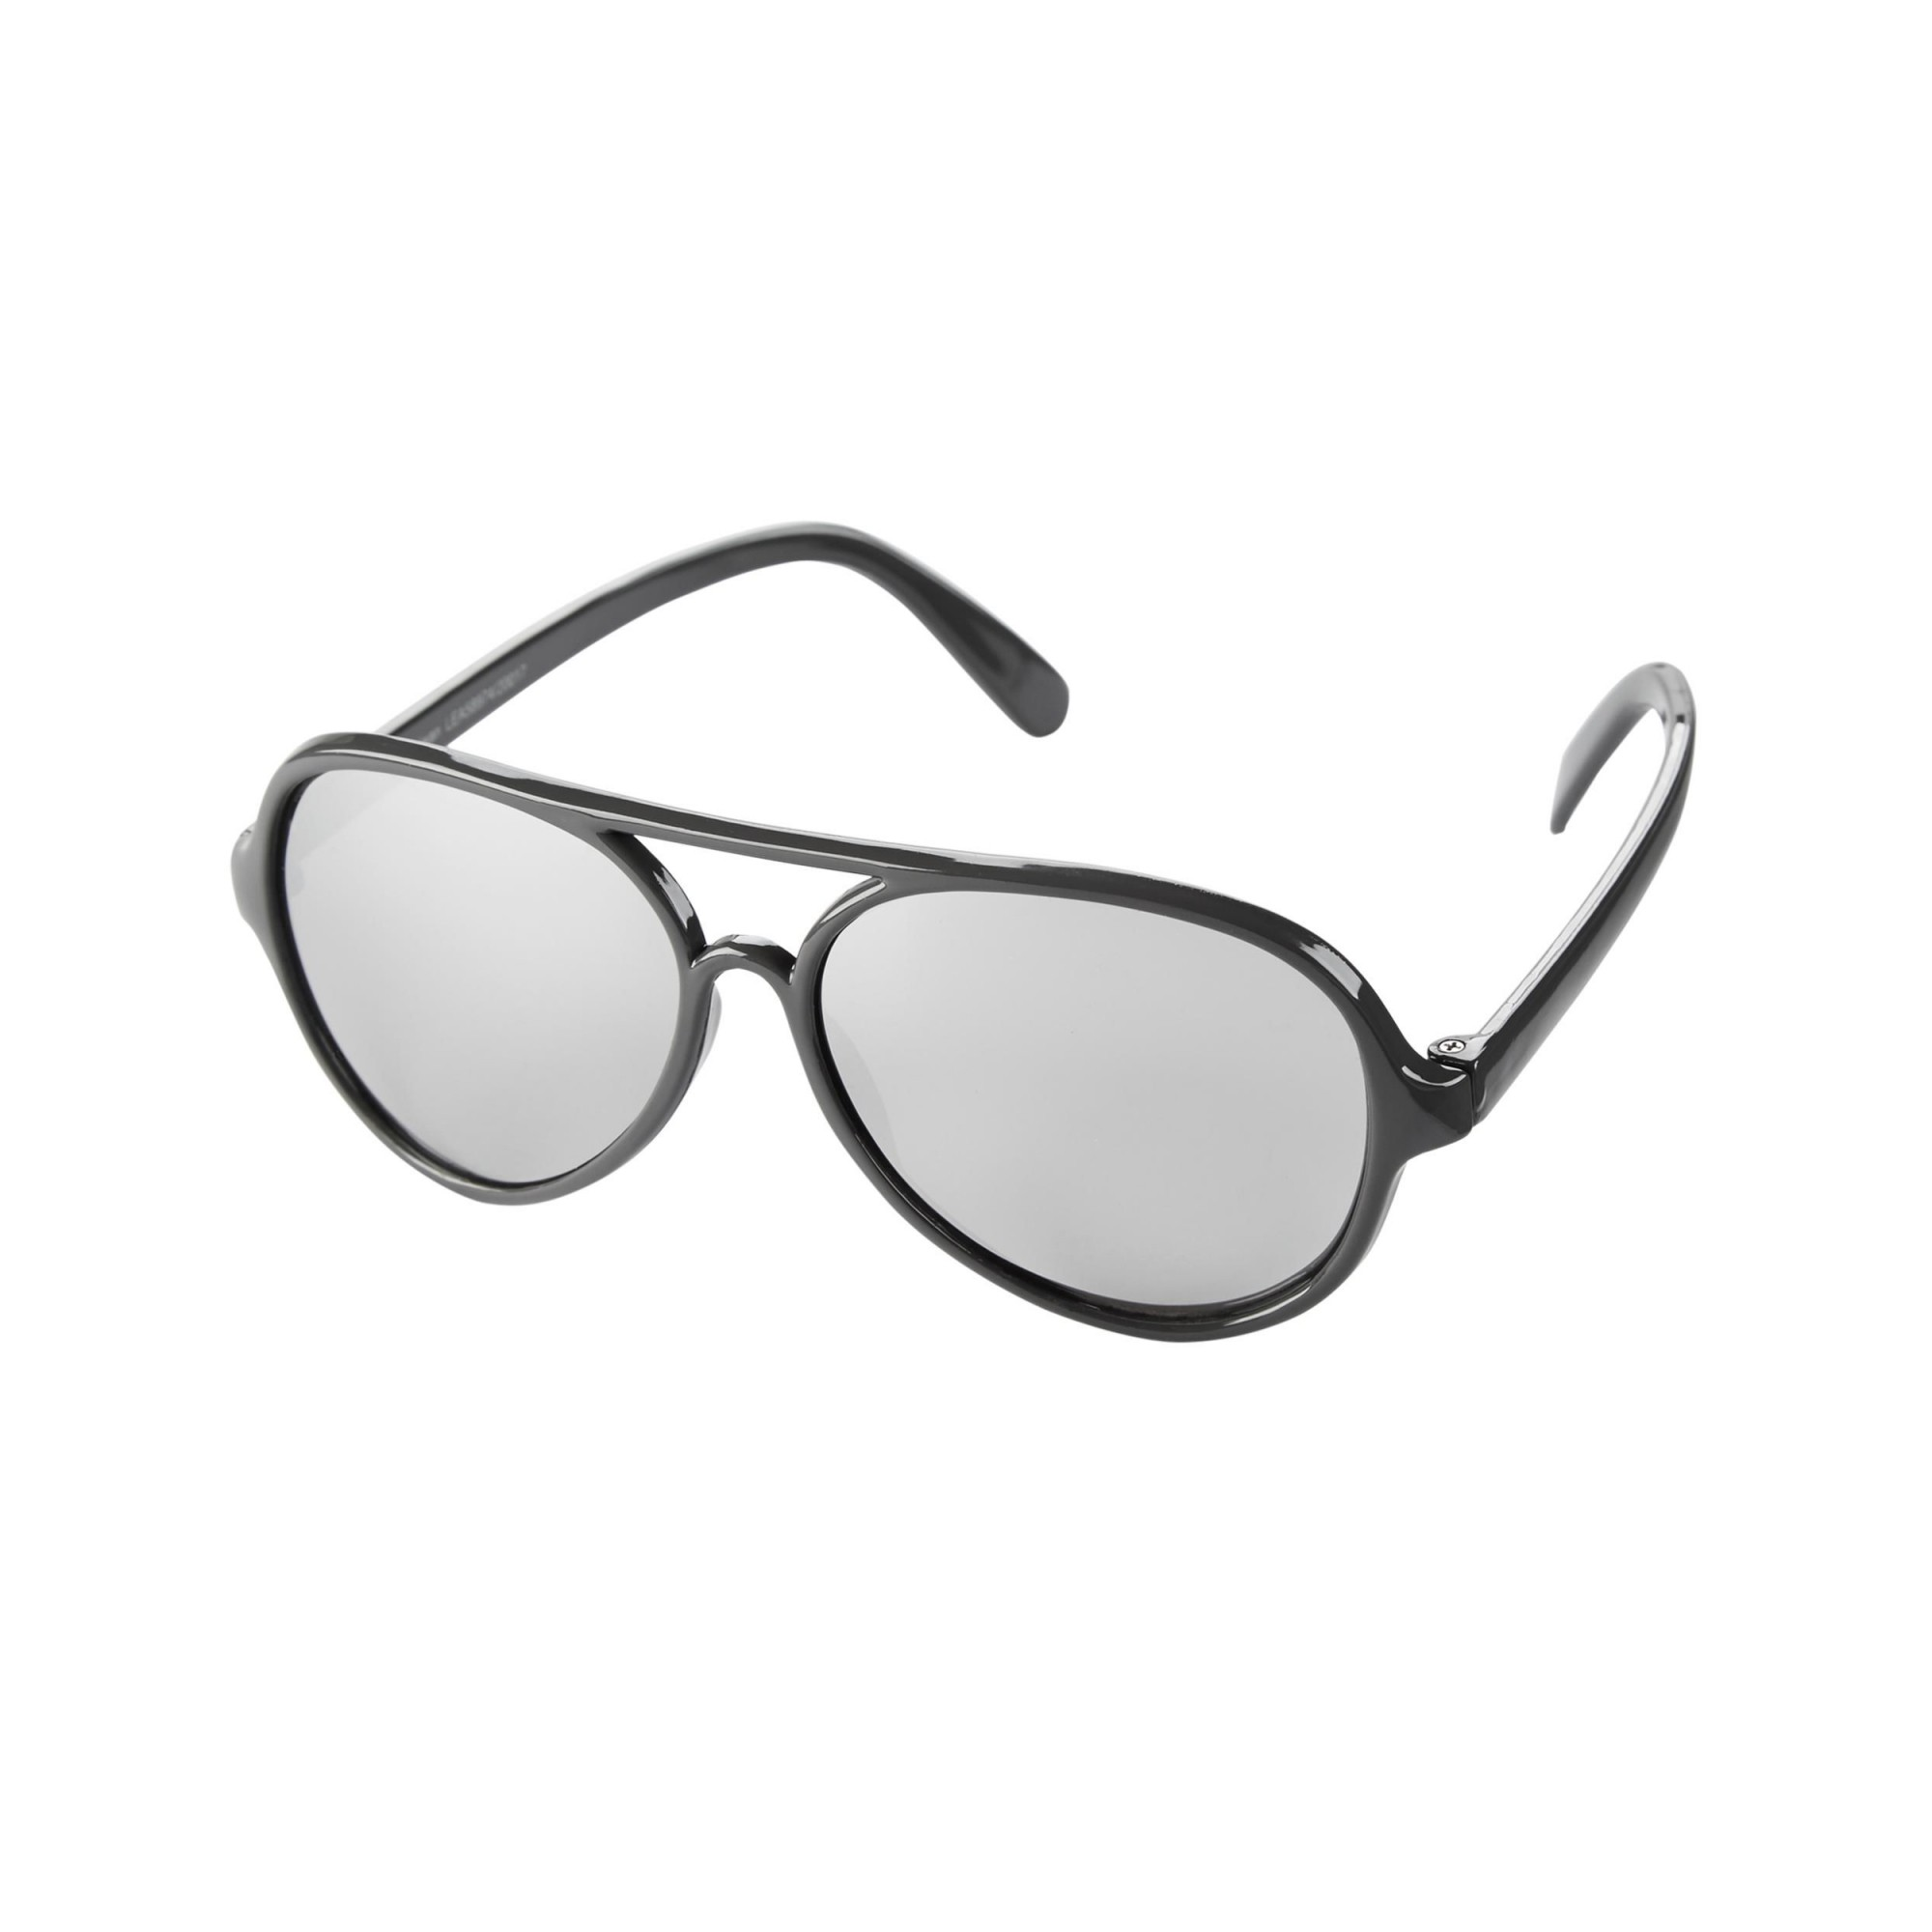 Oculos de Sol Carters Masculino - Tam 0-24 meses - Vitrine Baby 2679b0027d